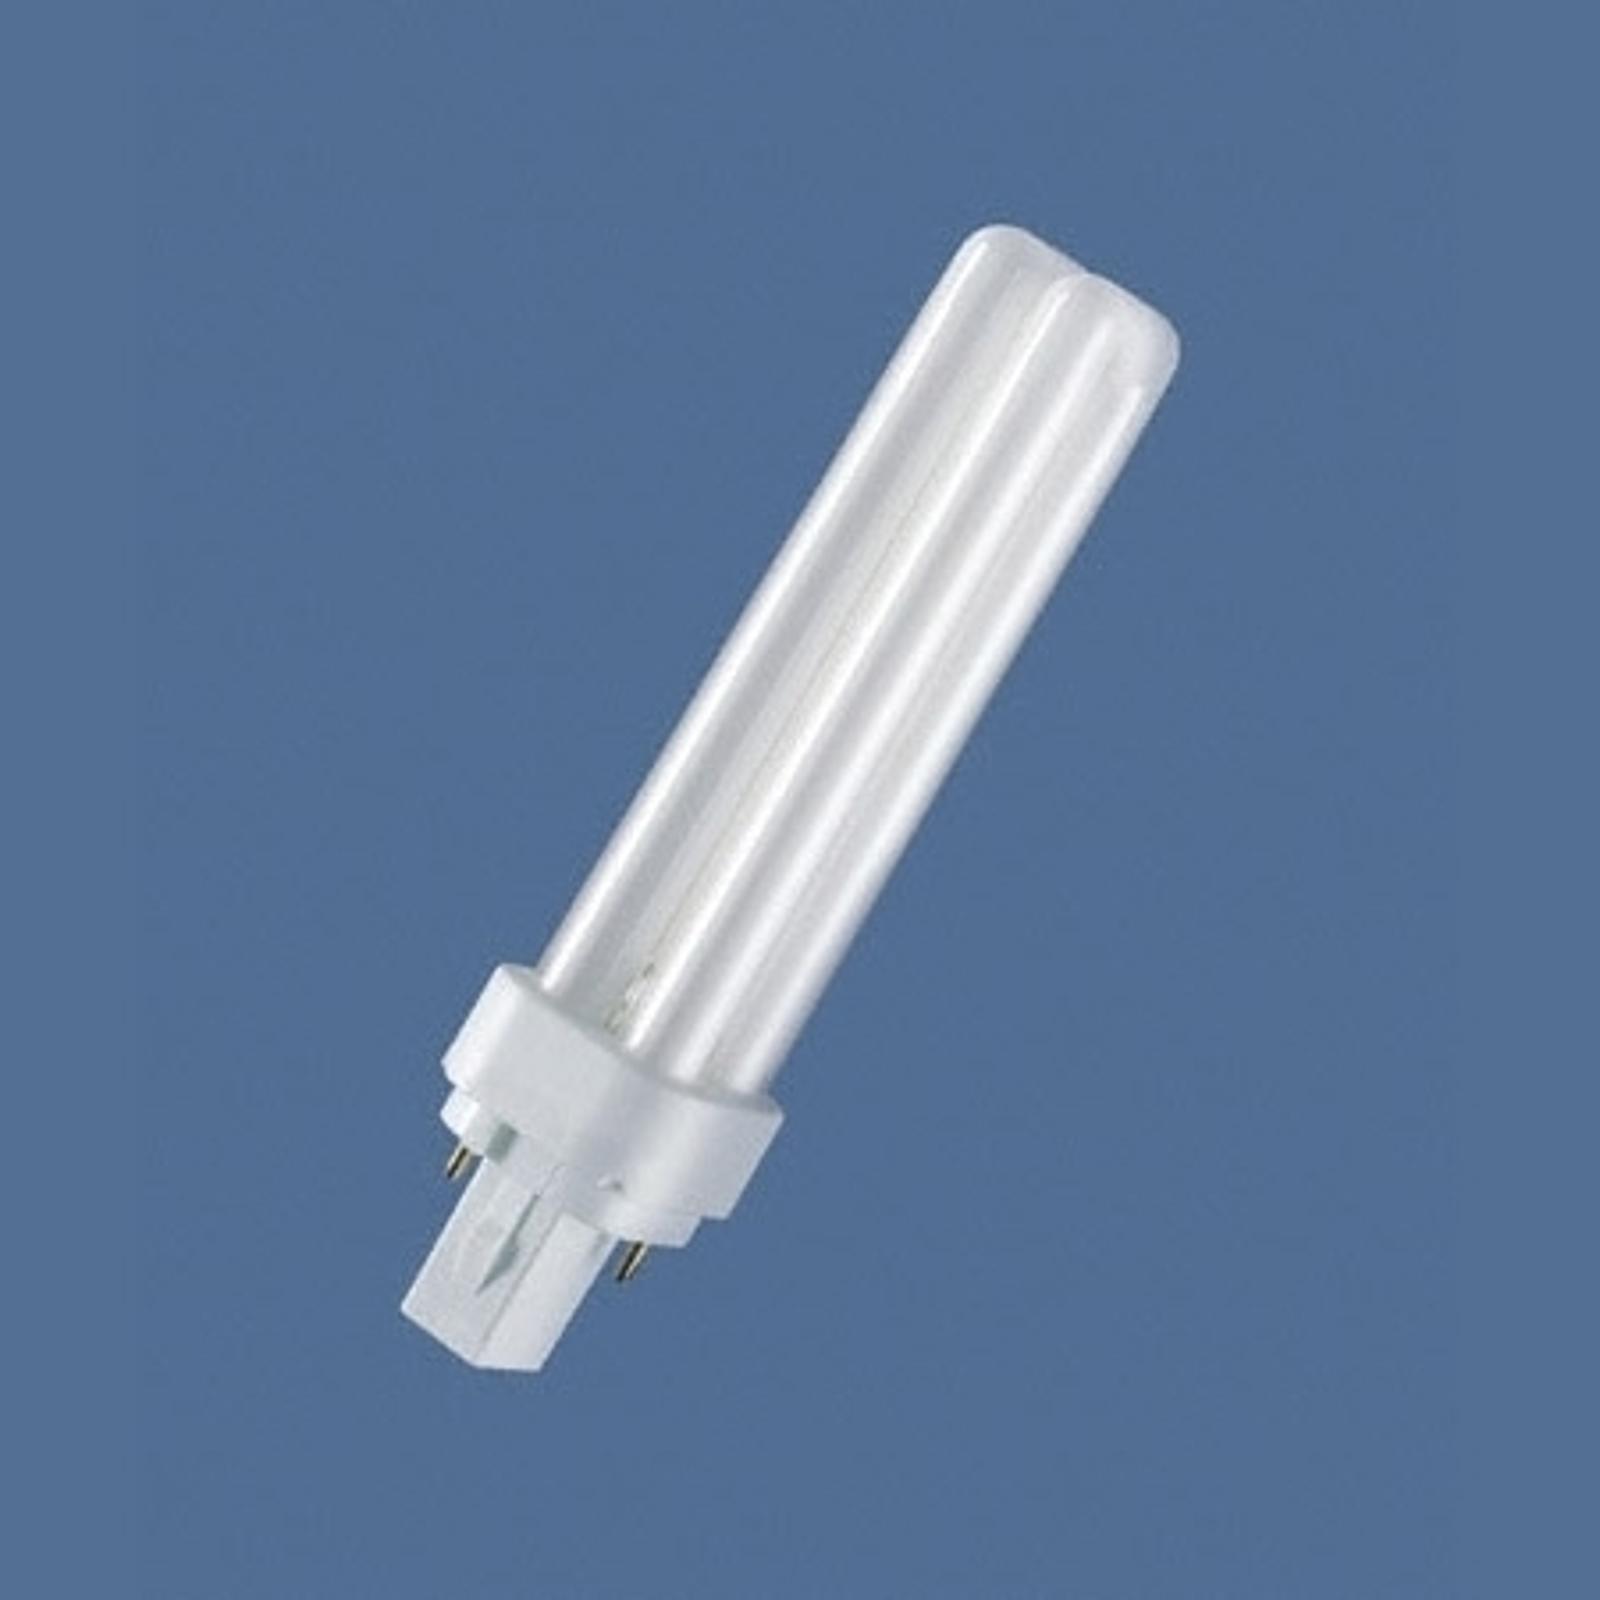 G24d 10W 840 Kompaktleuchtstofflampe Dulux D